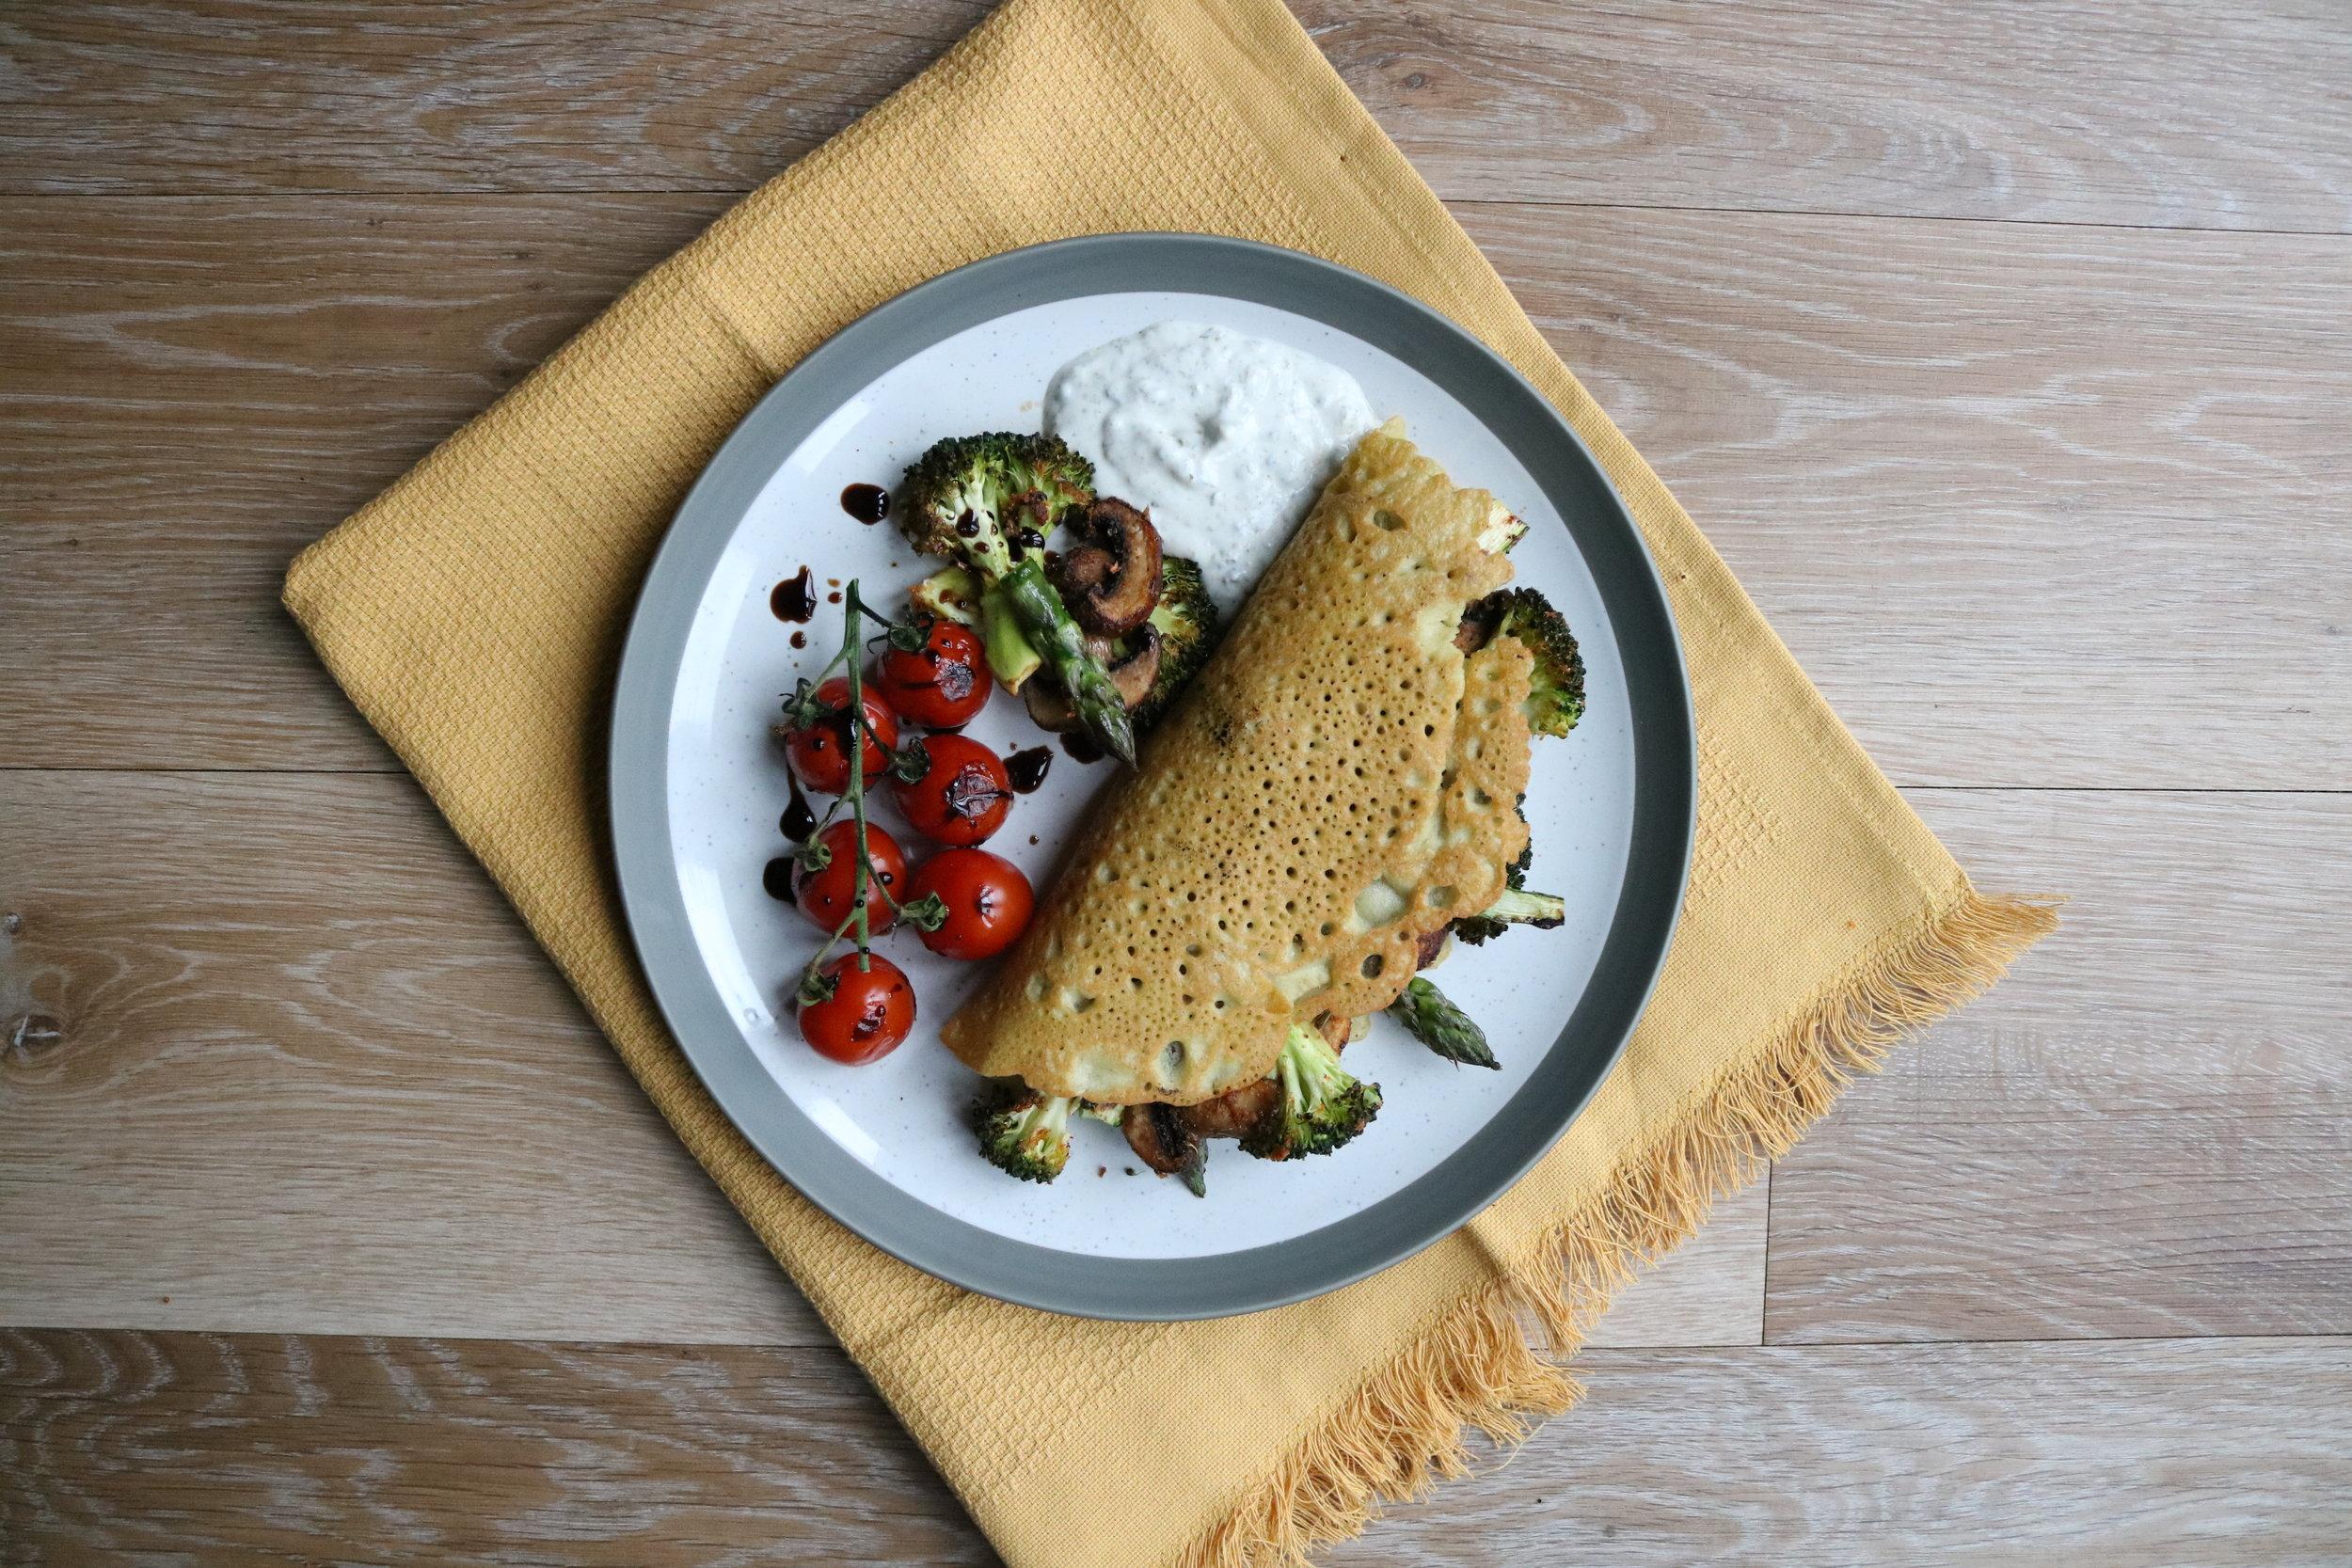 Socca - a savoury Italian pancake